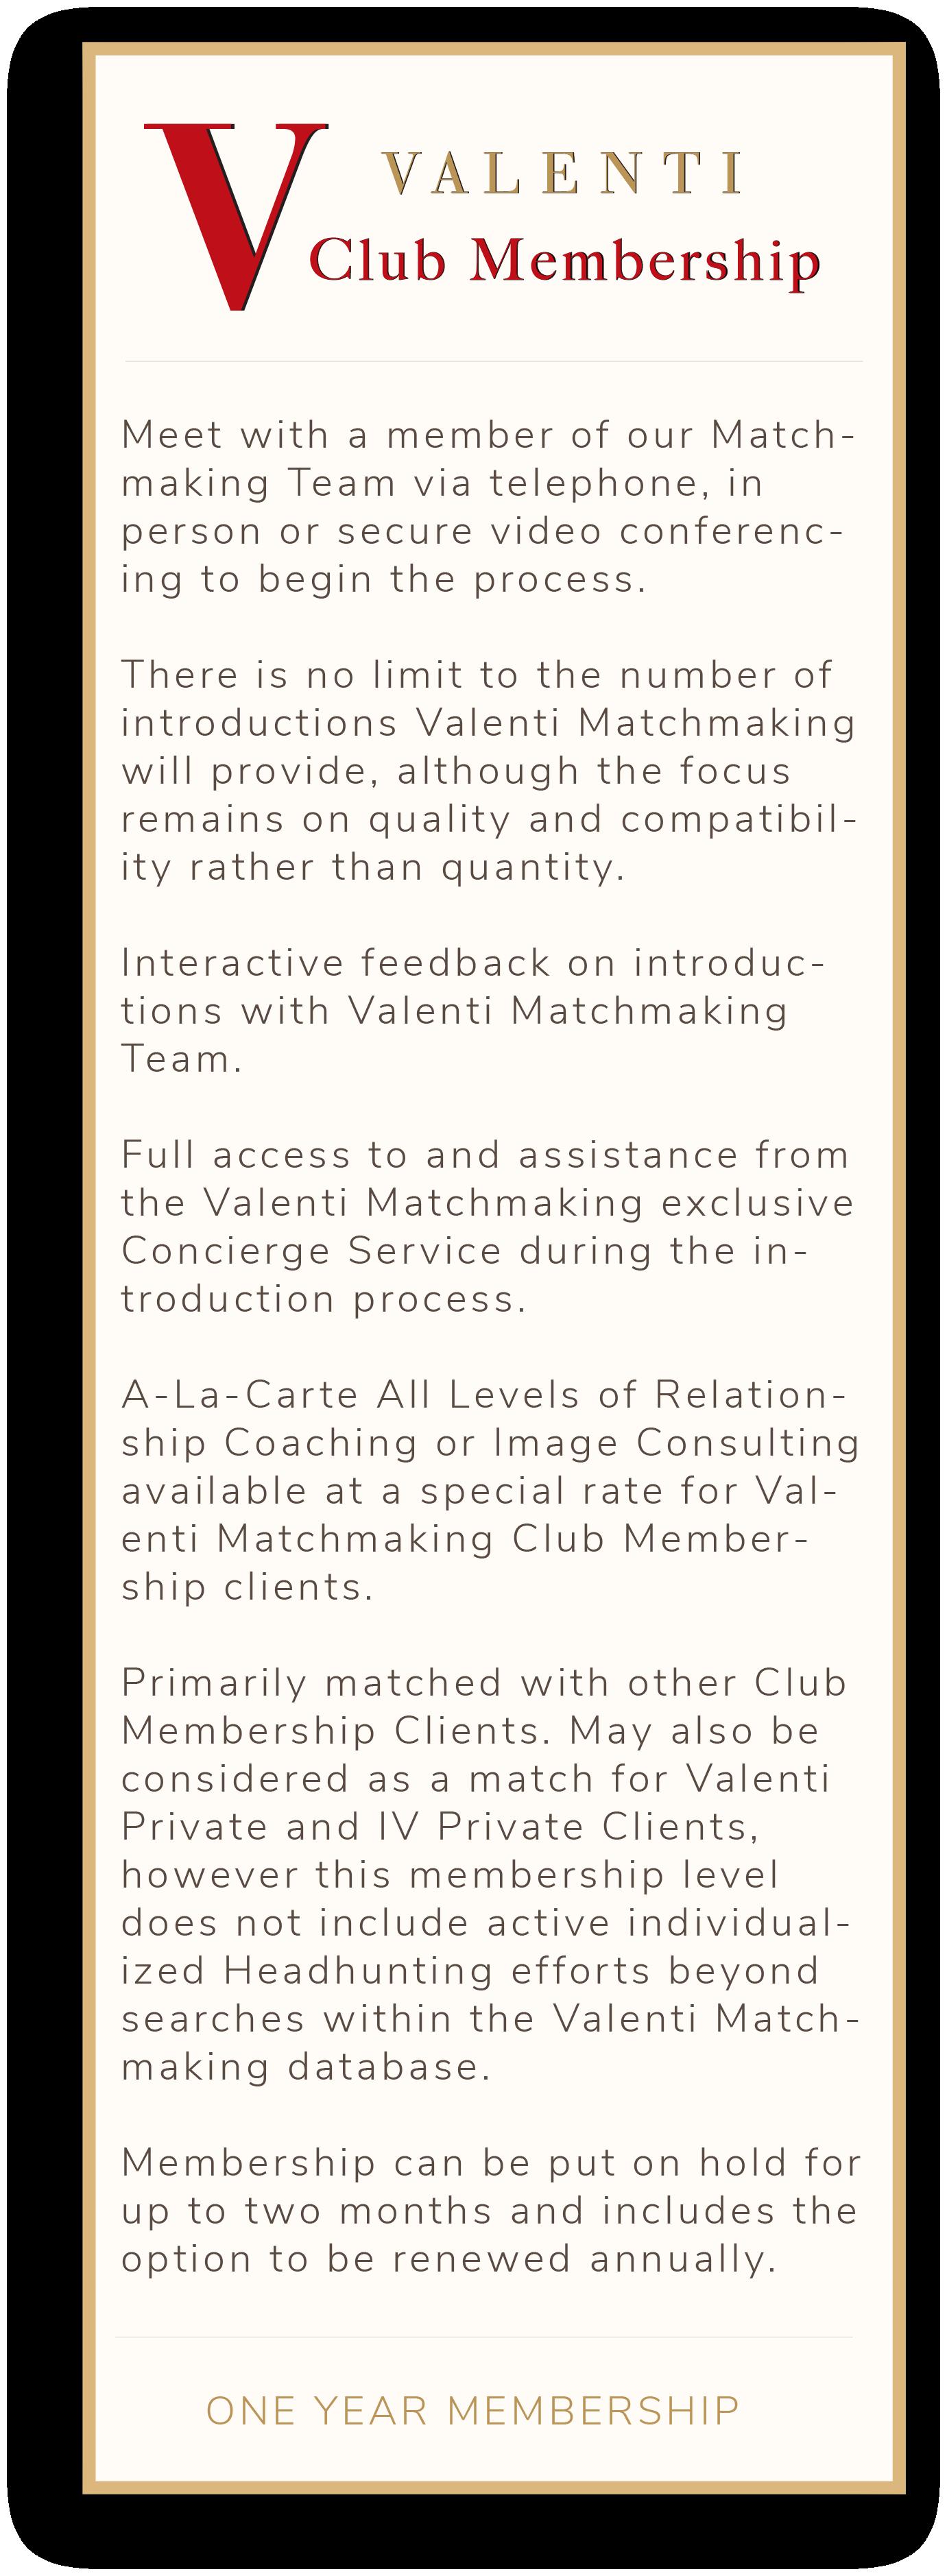 https://www.valentimatchmaking.com/wp-content/uploads/2019/02/VCM-2.png